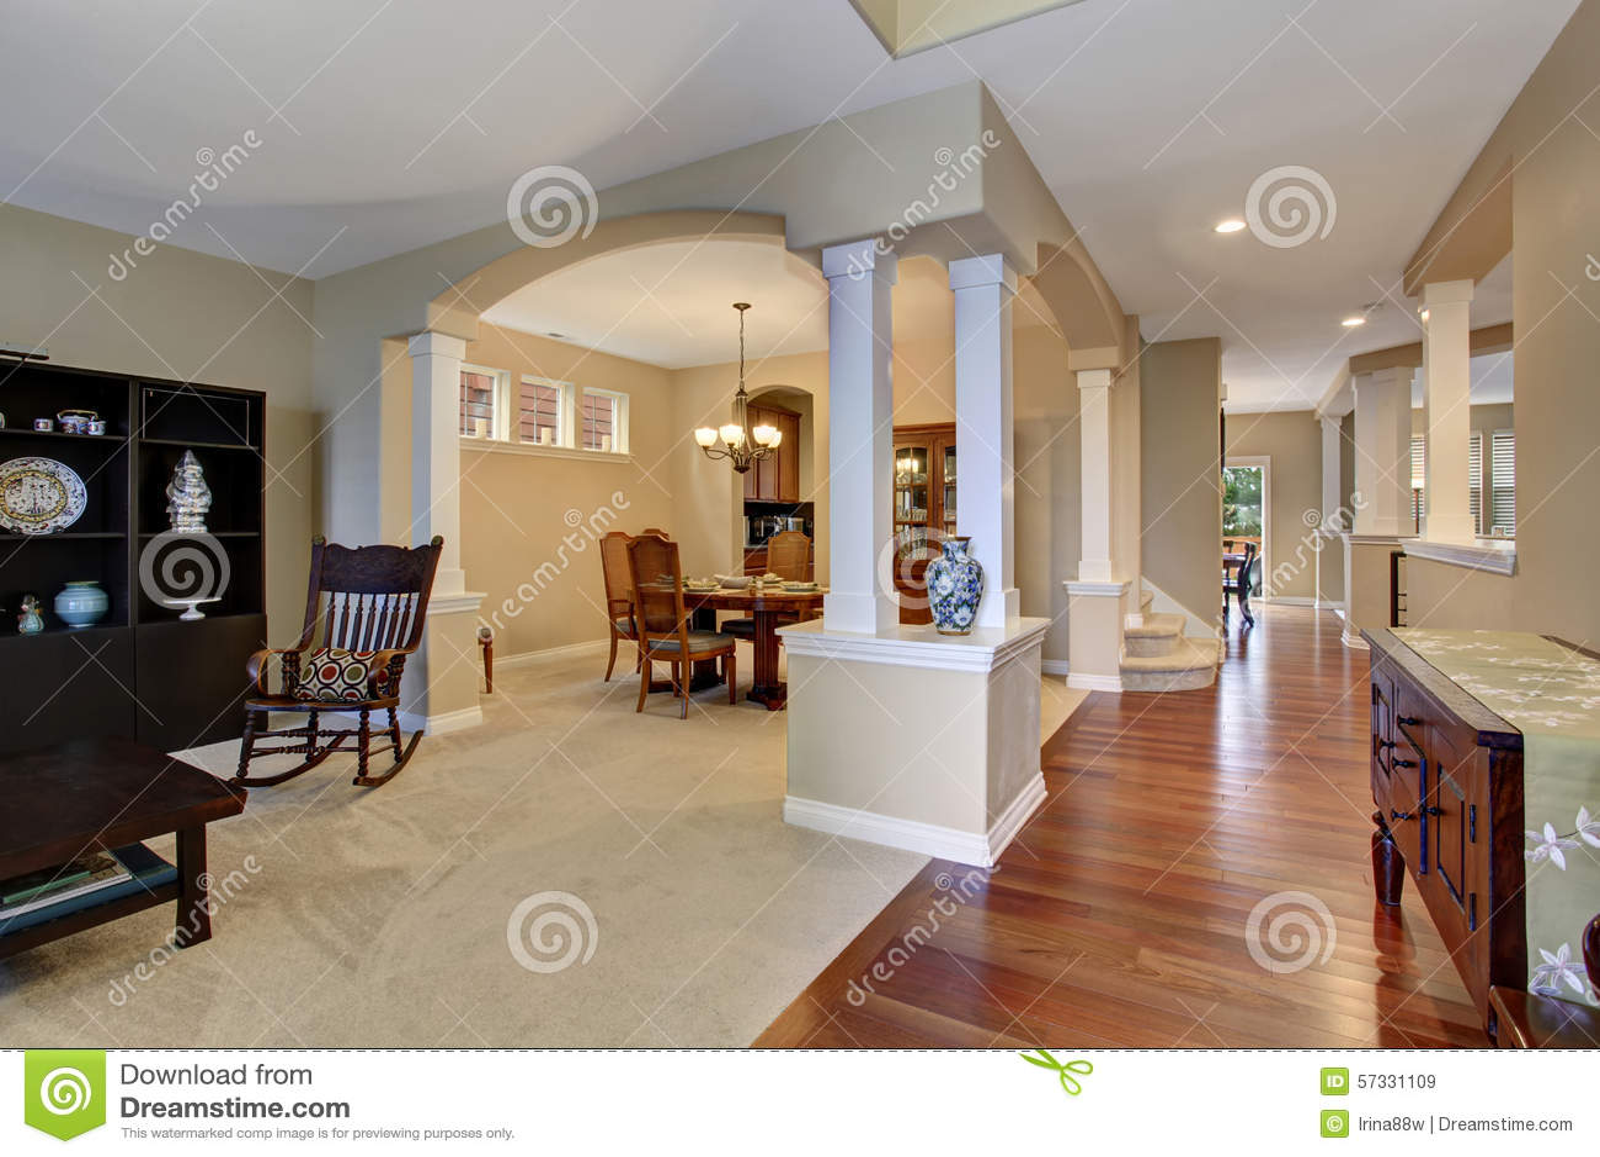 Elegant Entryway With Carpet And Hardwood Floor Stock